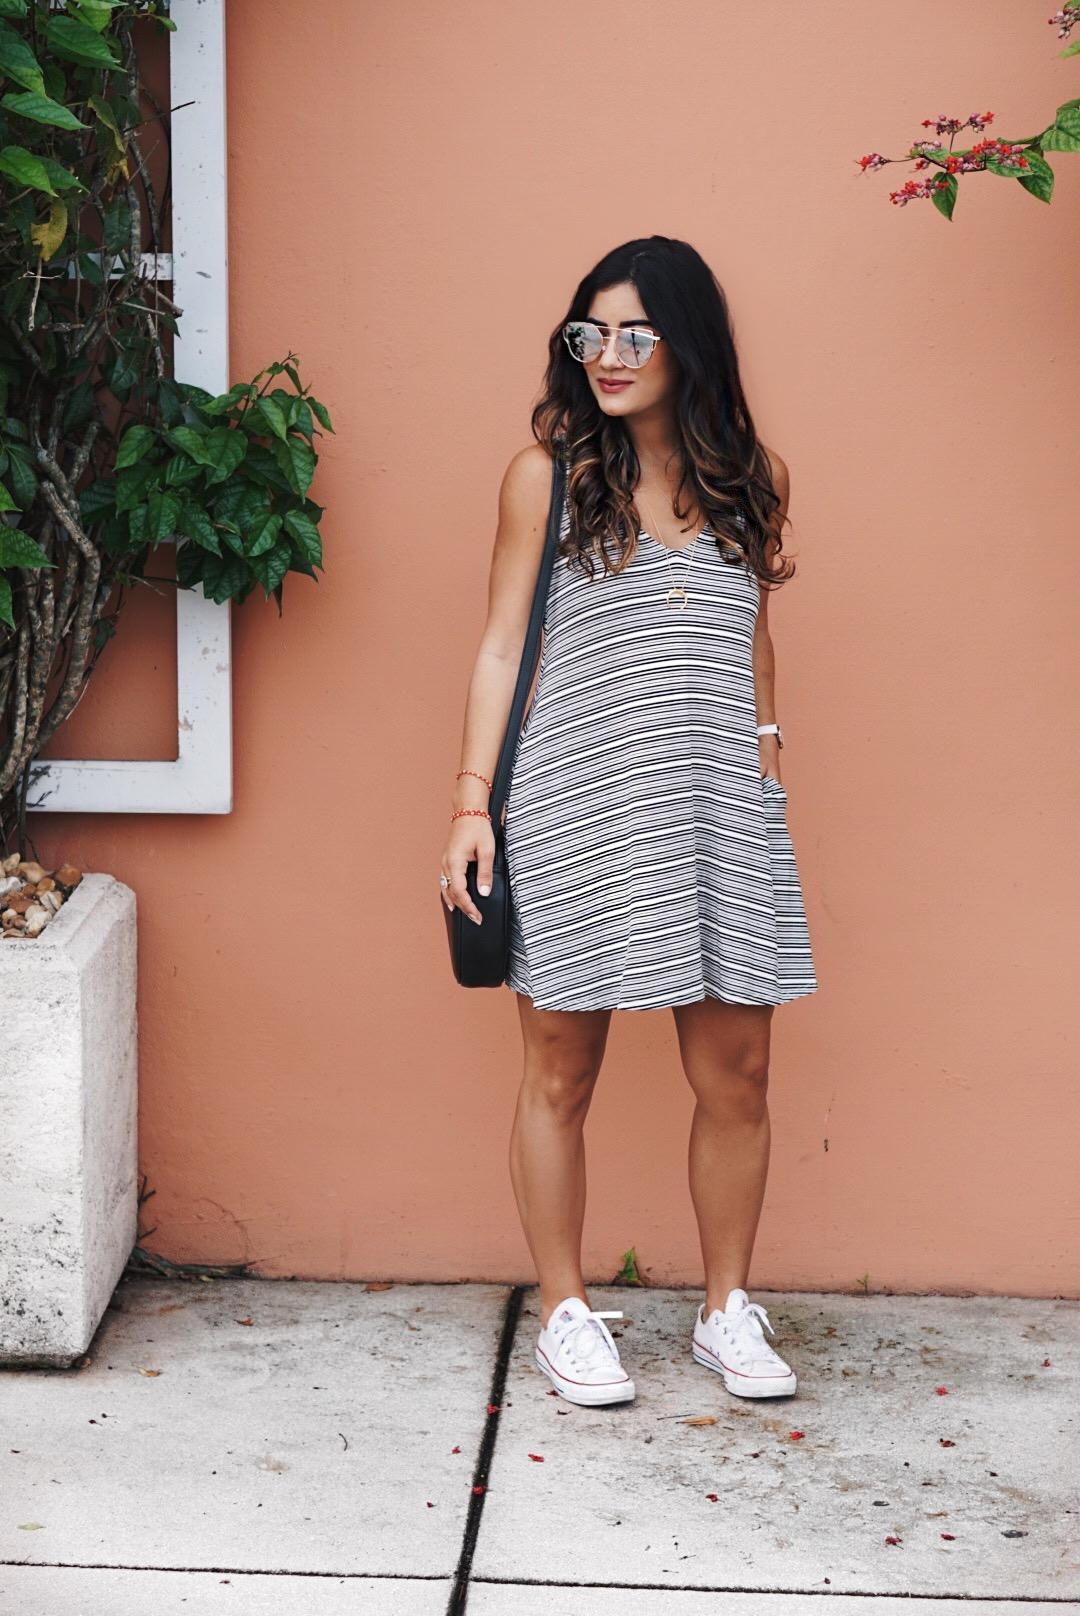 Sugar Love Chic blogger Krista Perez in Stripe Nordstrom Dress